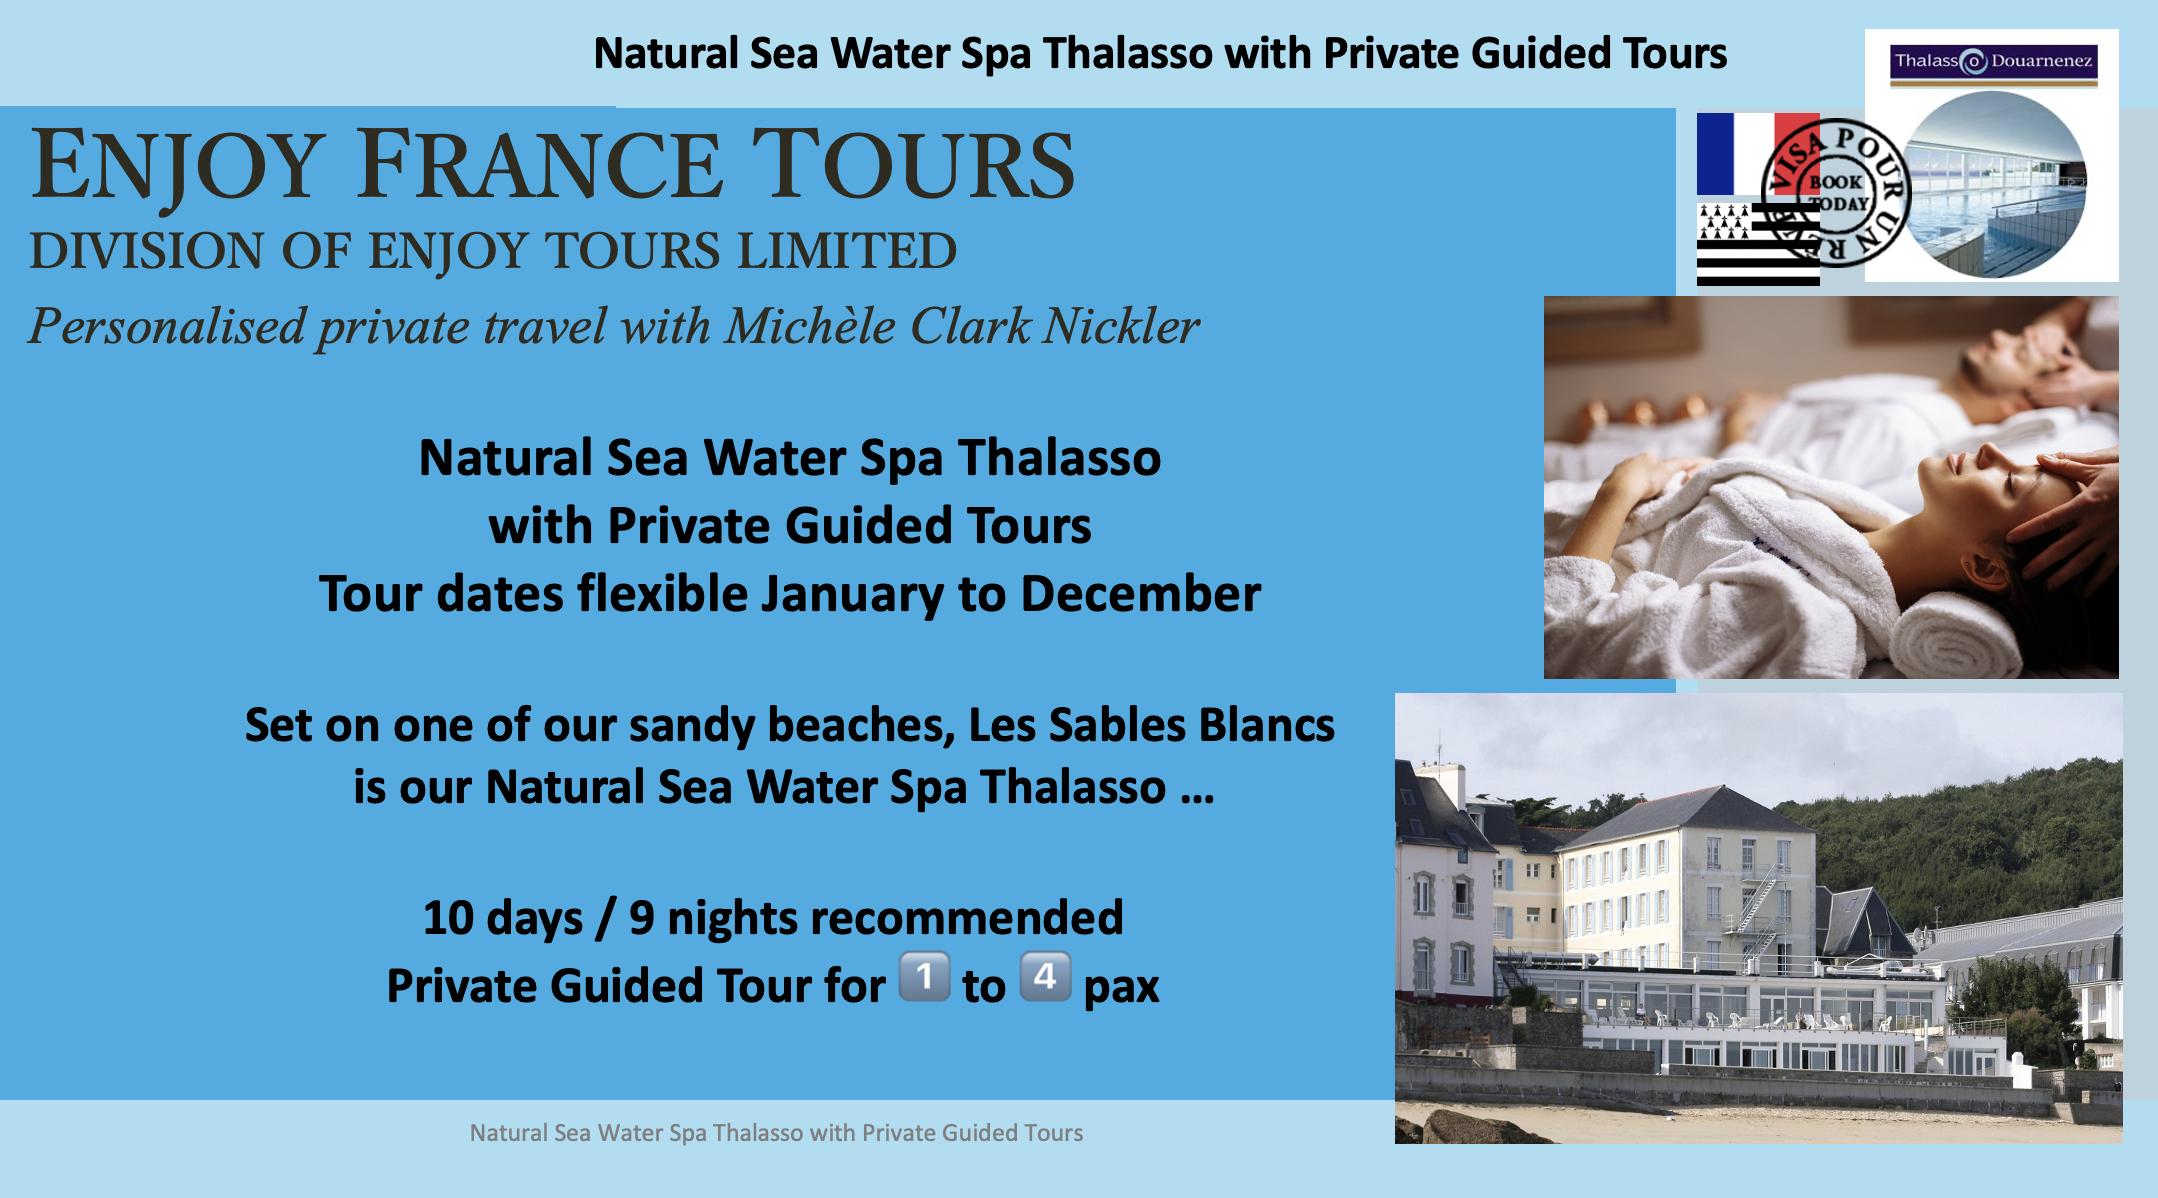 Enjoy France Tours NATURAL SEA WATER SPA THALASSO Website Pg 1